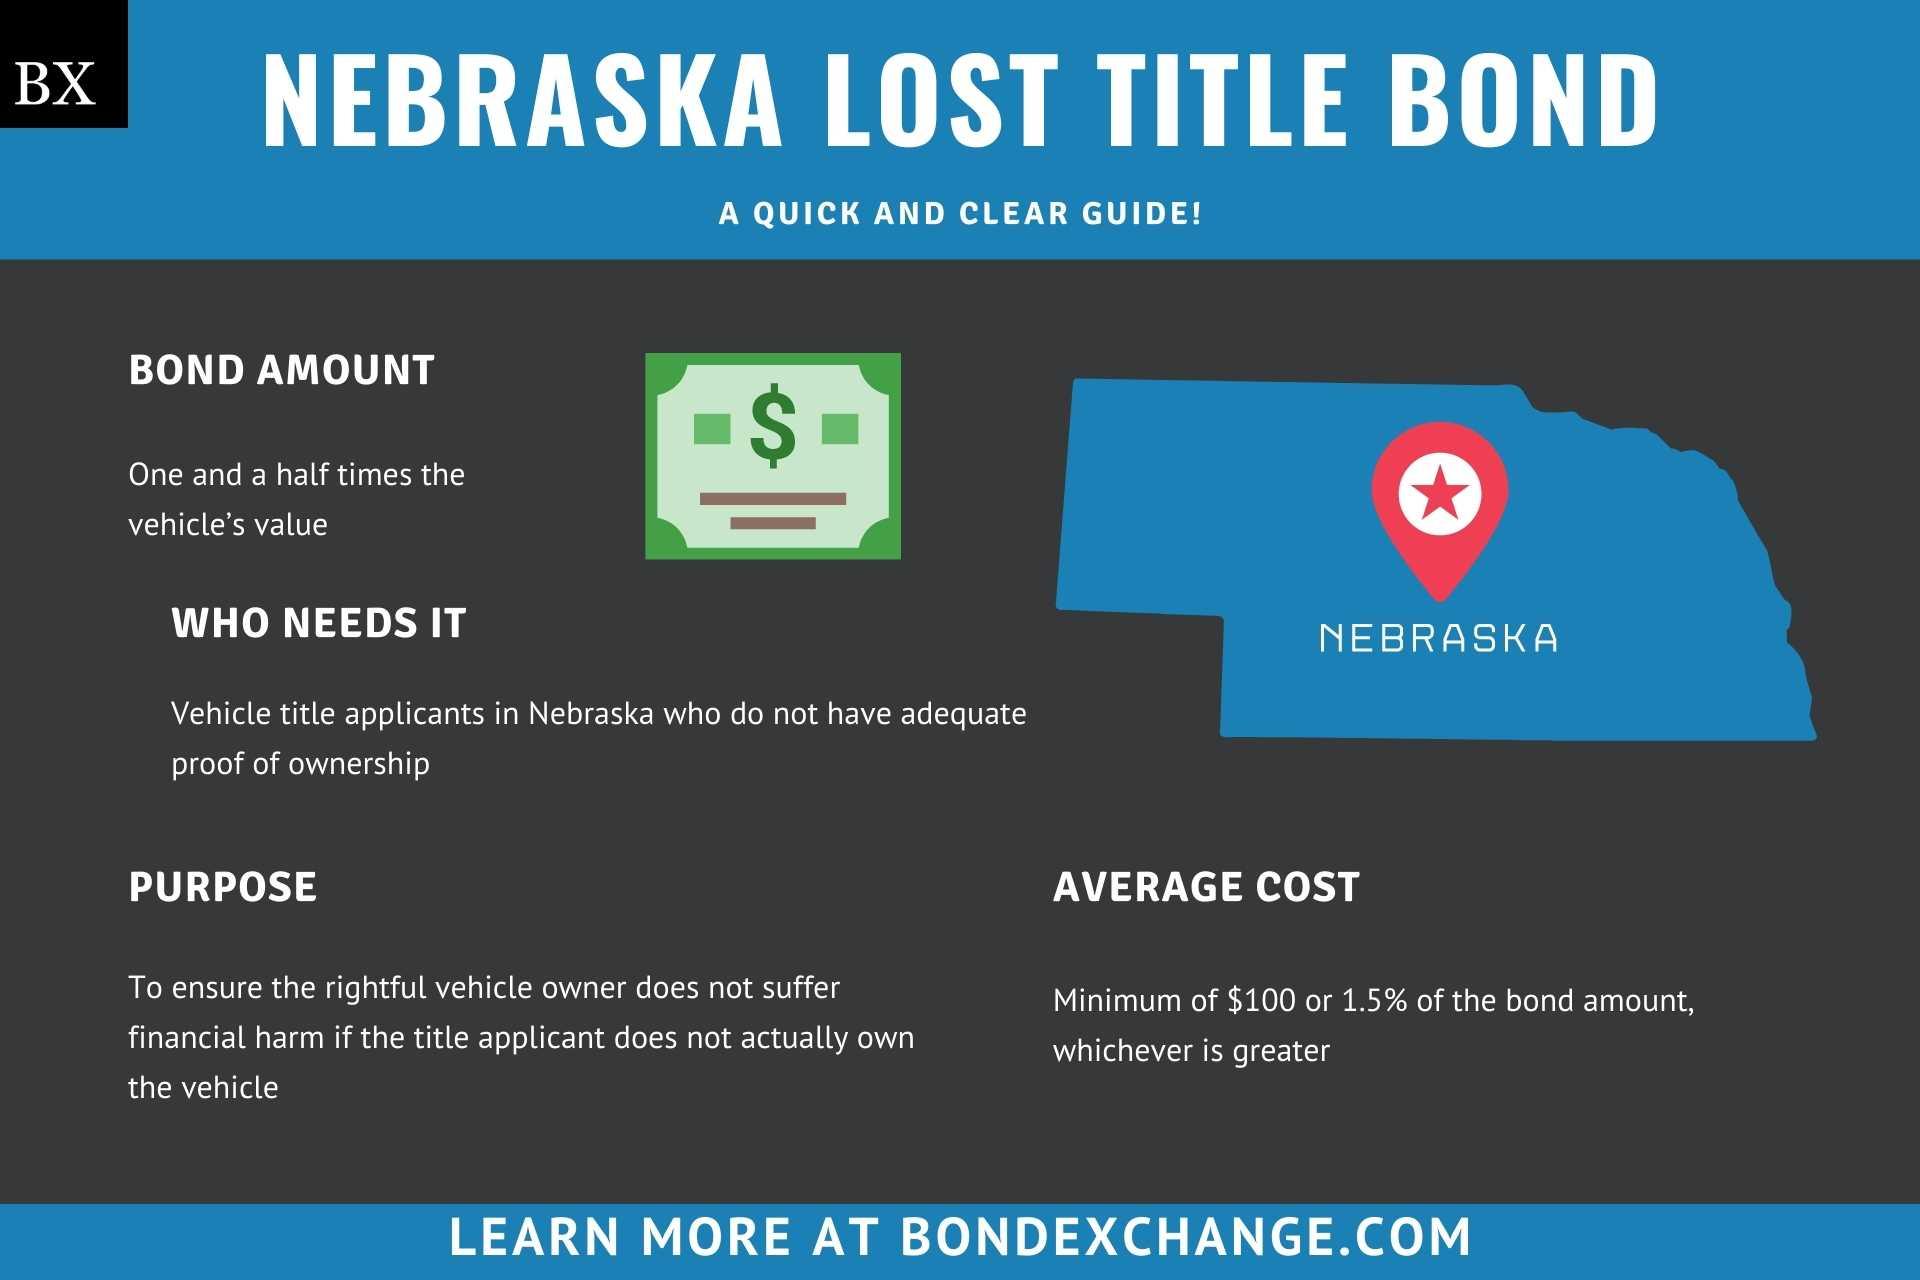 Nebraska Lost Title Bond